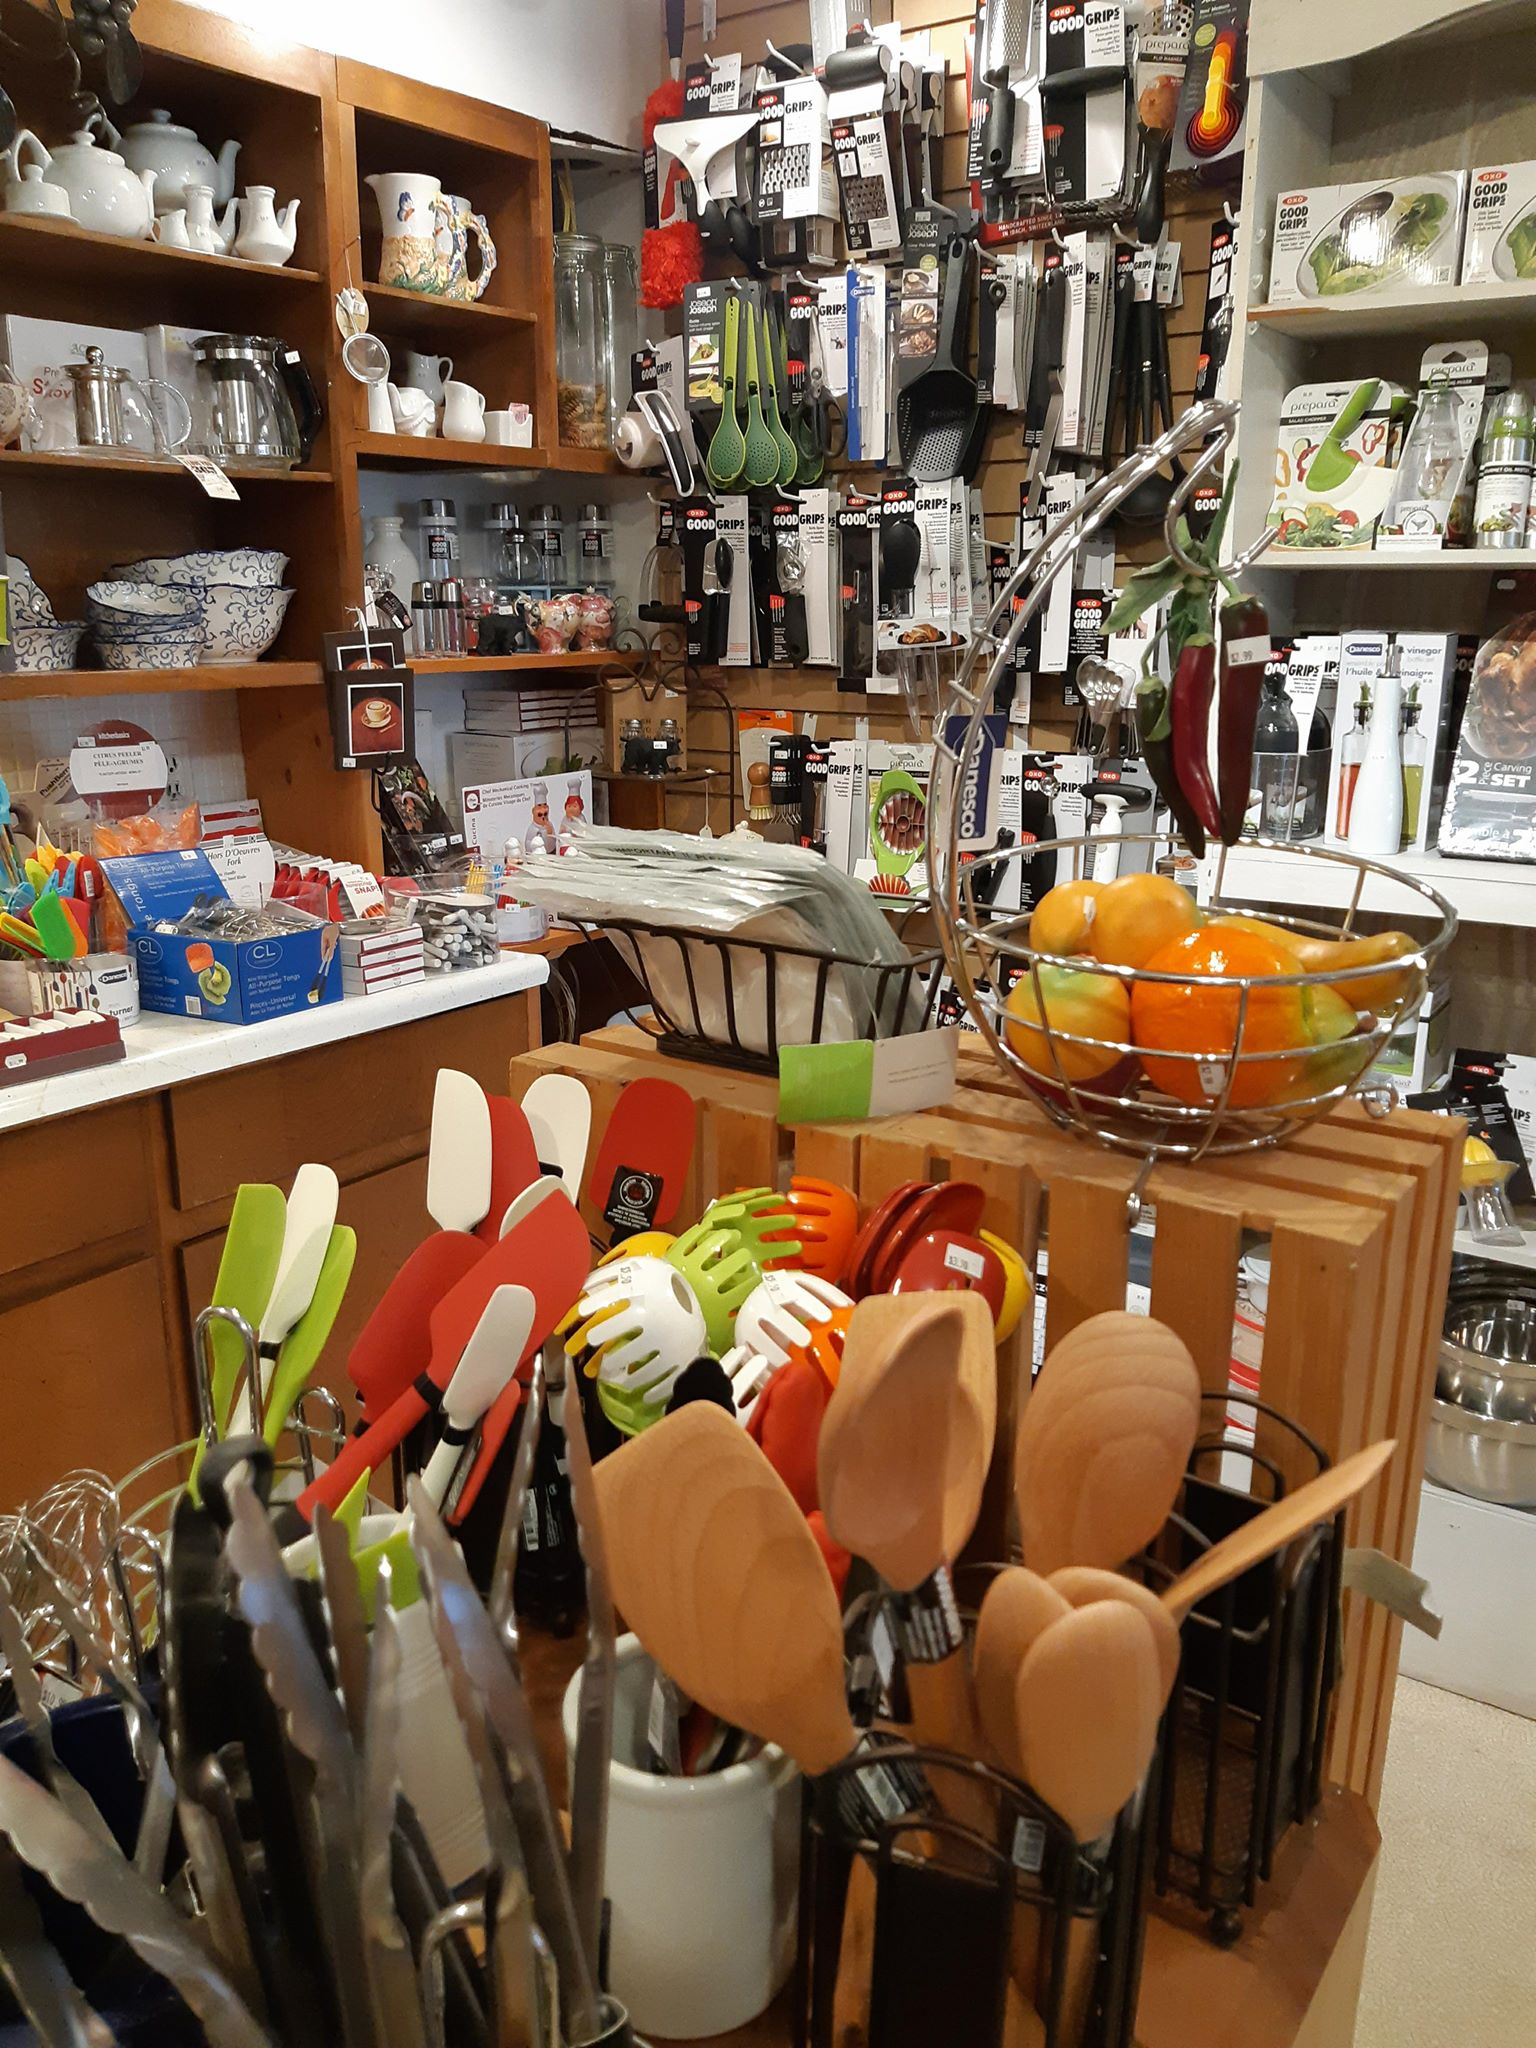 spoons kitchen stuff